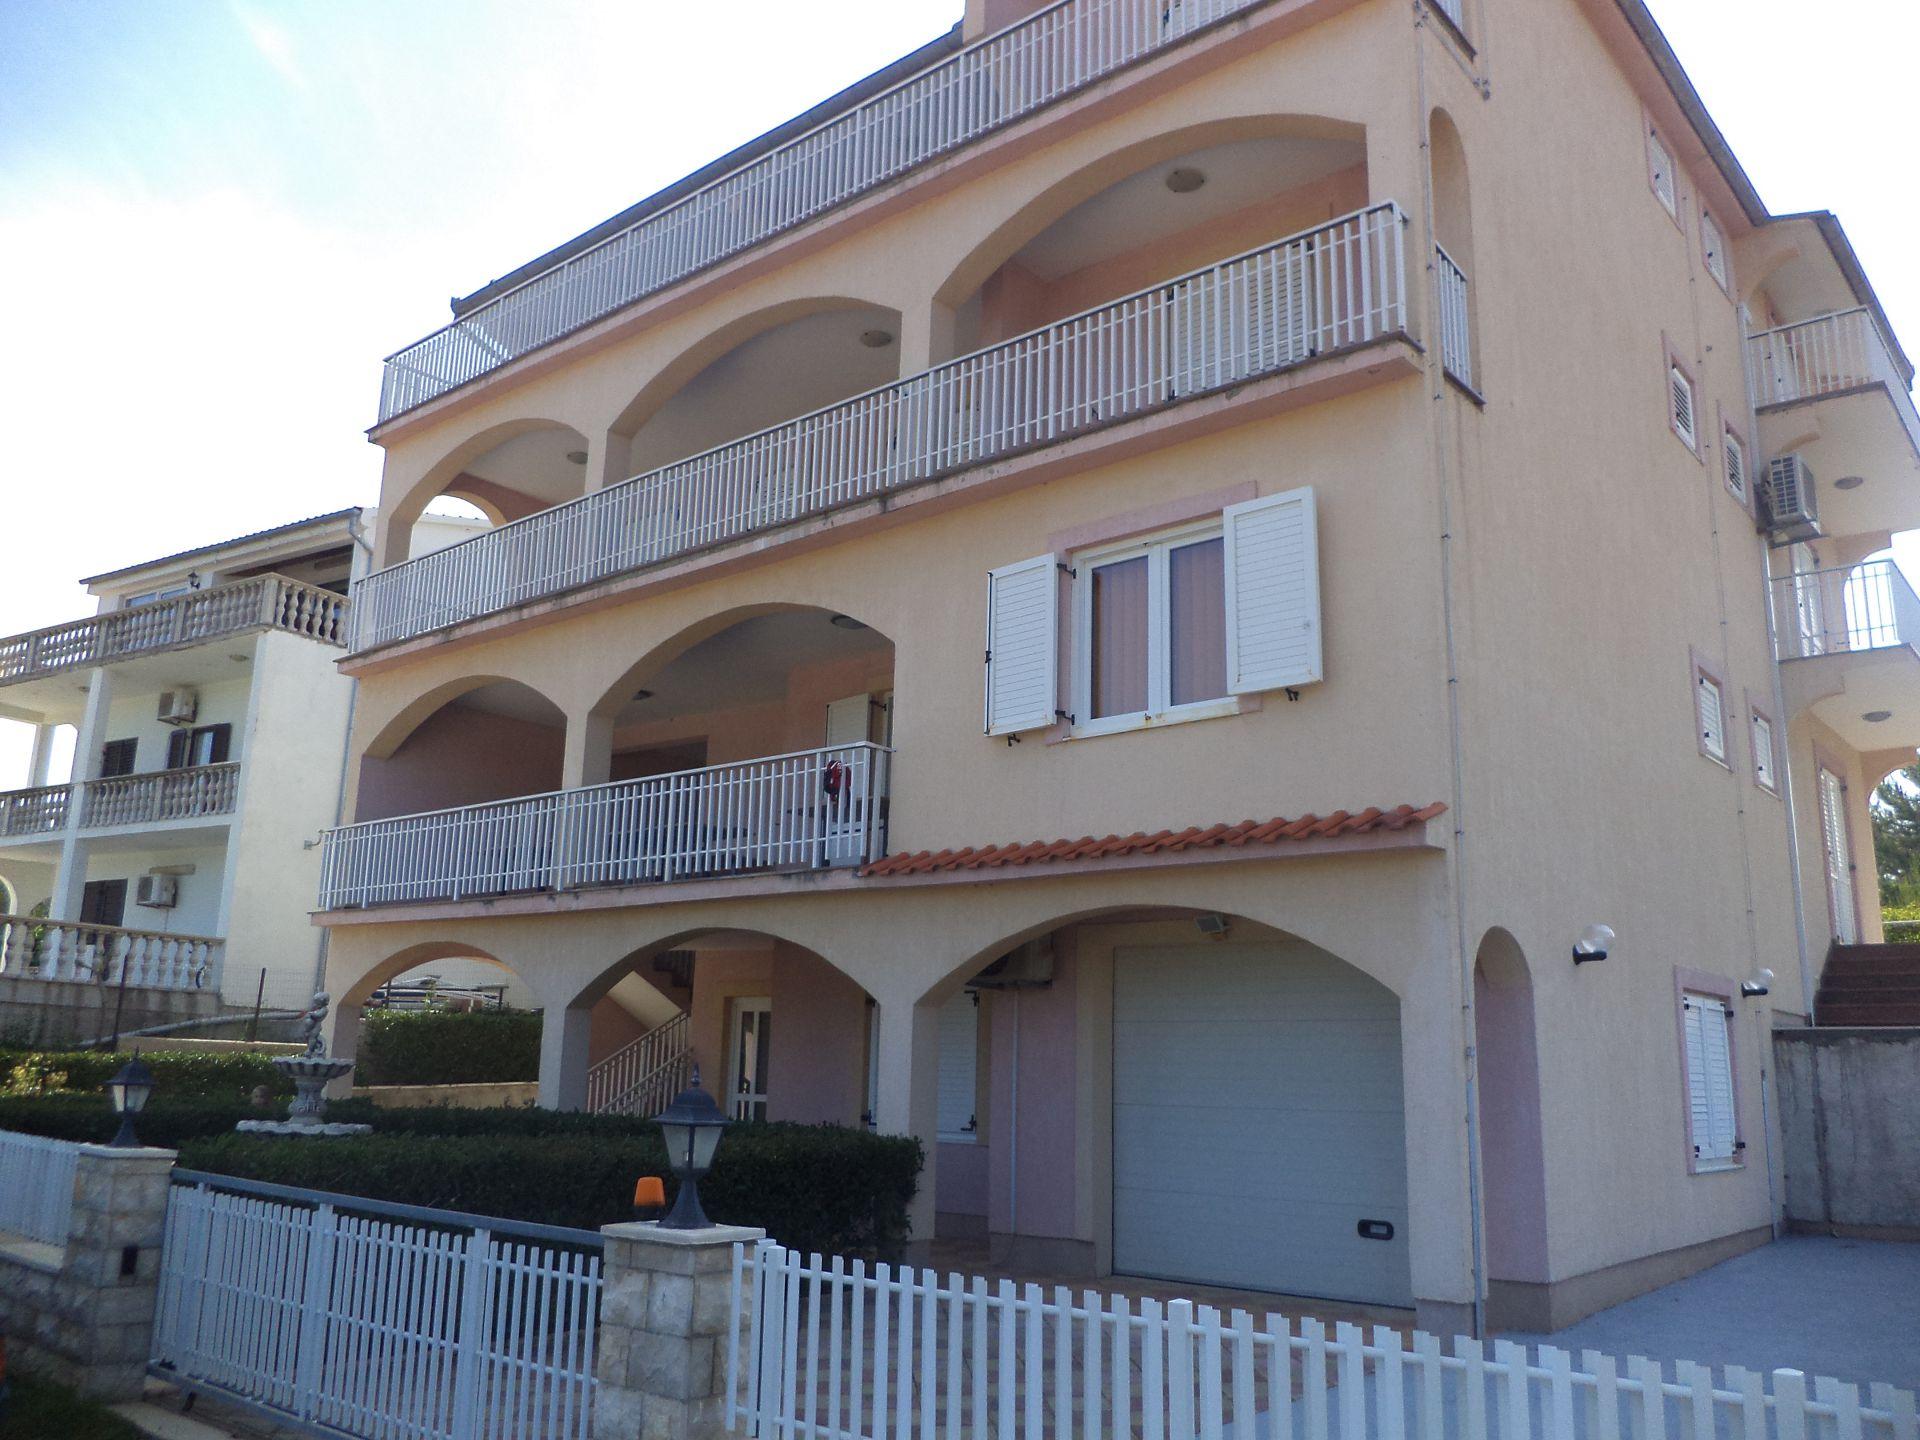 8243 - Pridraga - Appartementen Kroatië